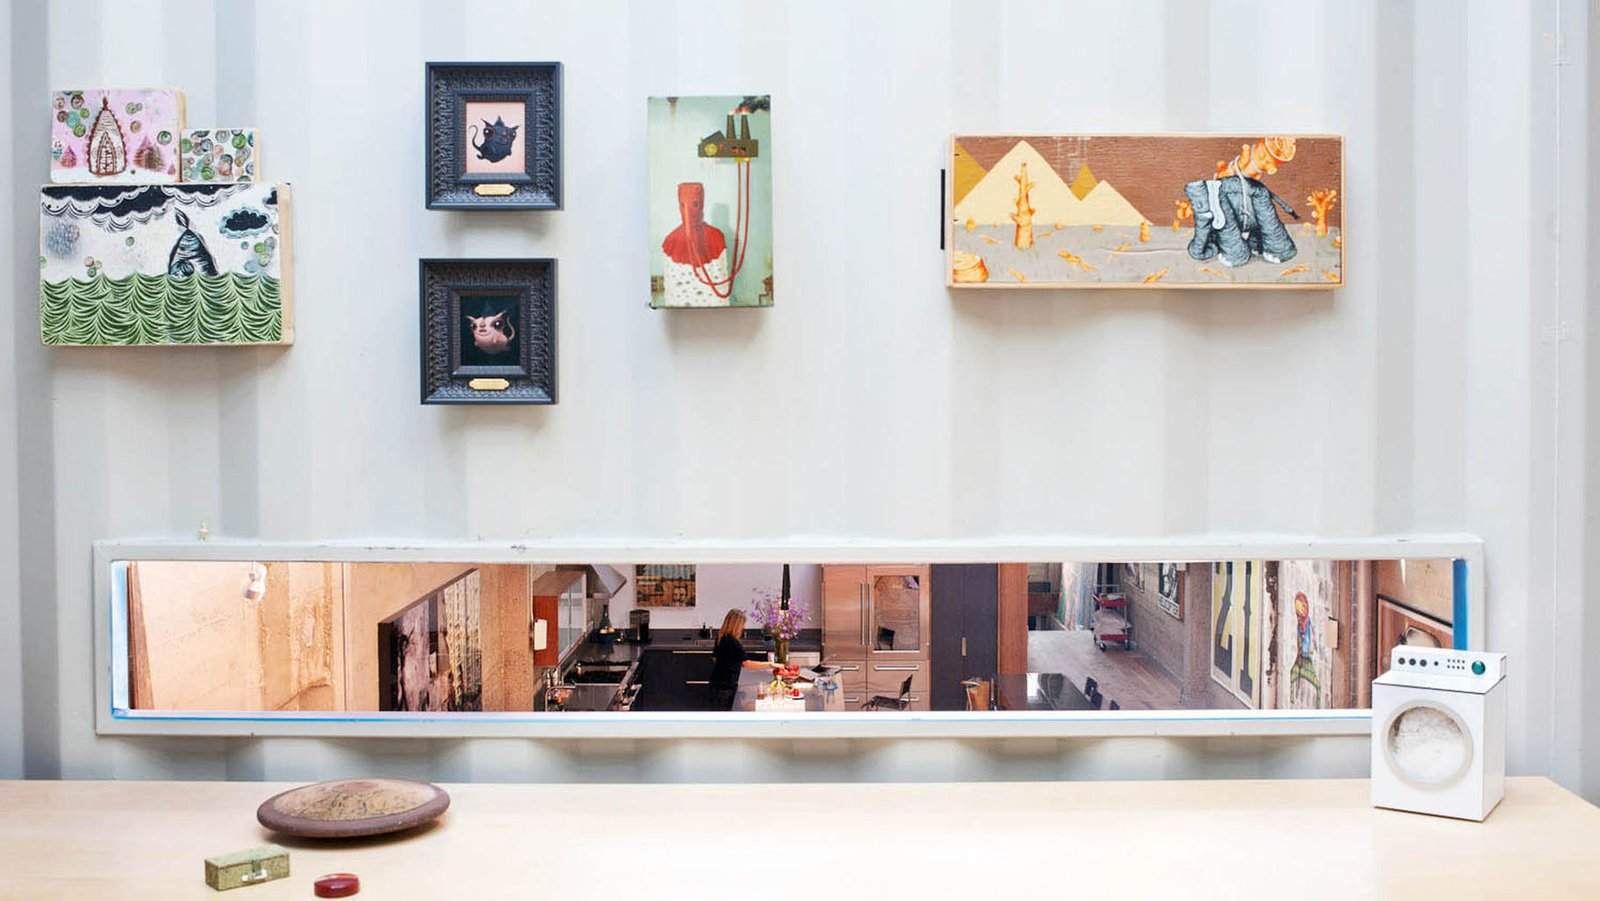 #lundberg #lundbergdesign #sanfrancisco #windows #glass #concrete #warehouse #interior #stairs  #kitchen   Wardell Sagan Residence by Lundberg Design